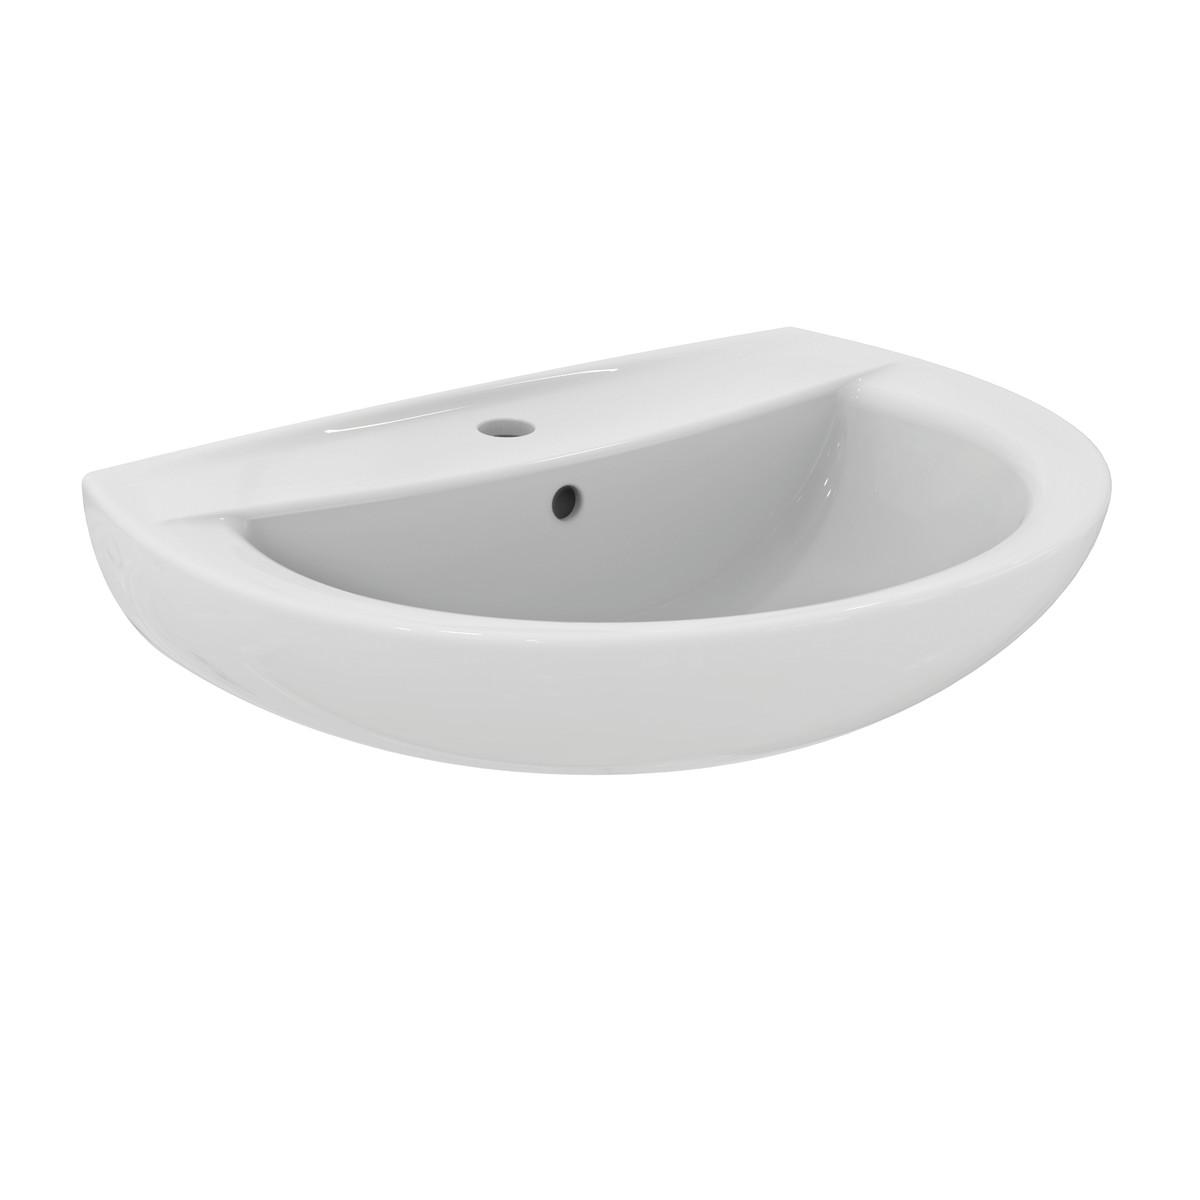 Rubinetti lavabo bagno leroy merlin lavabo bagno leroy - Mensola lavabo leroy merlin ...